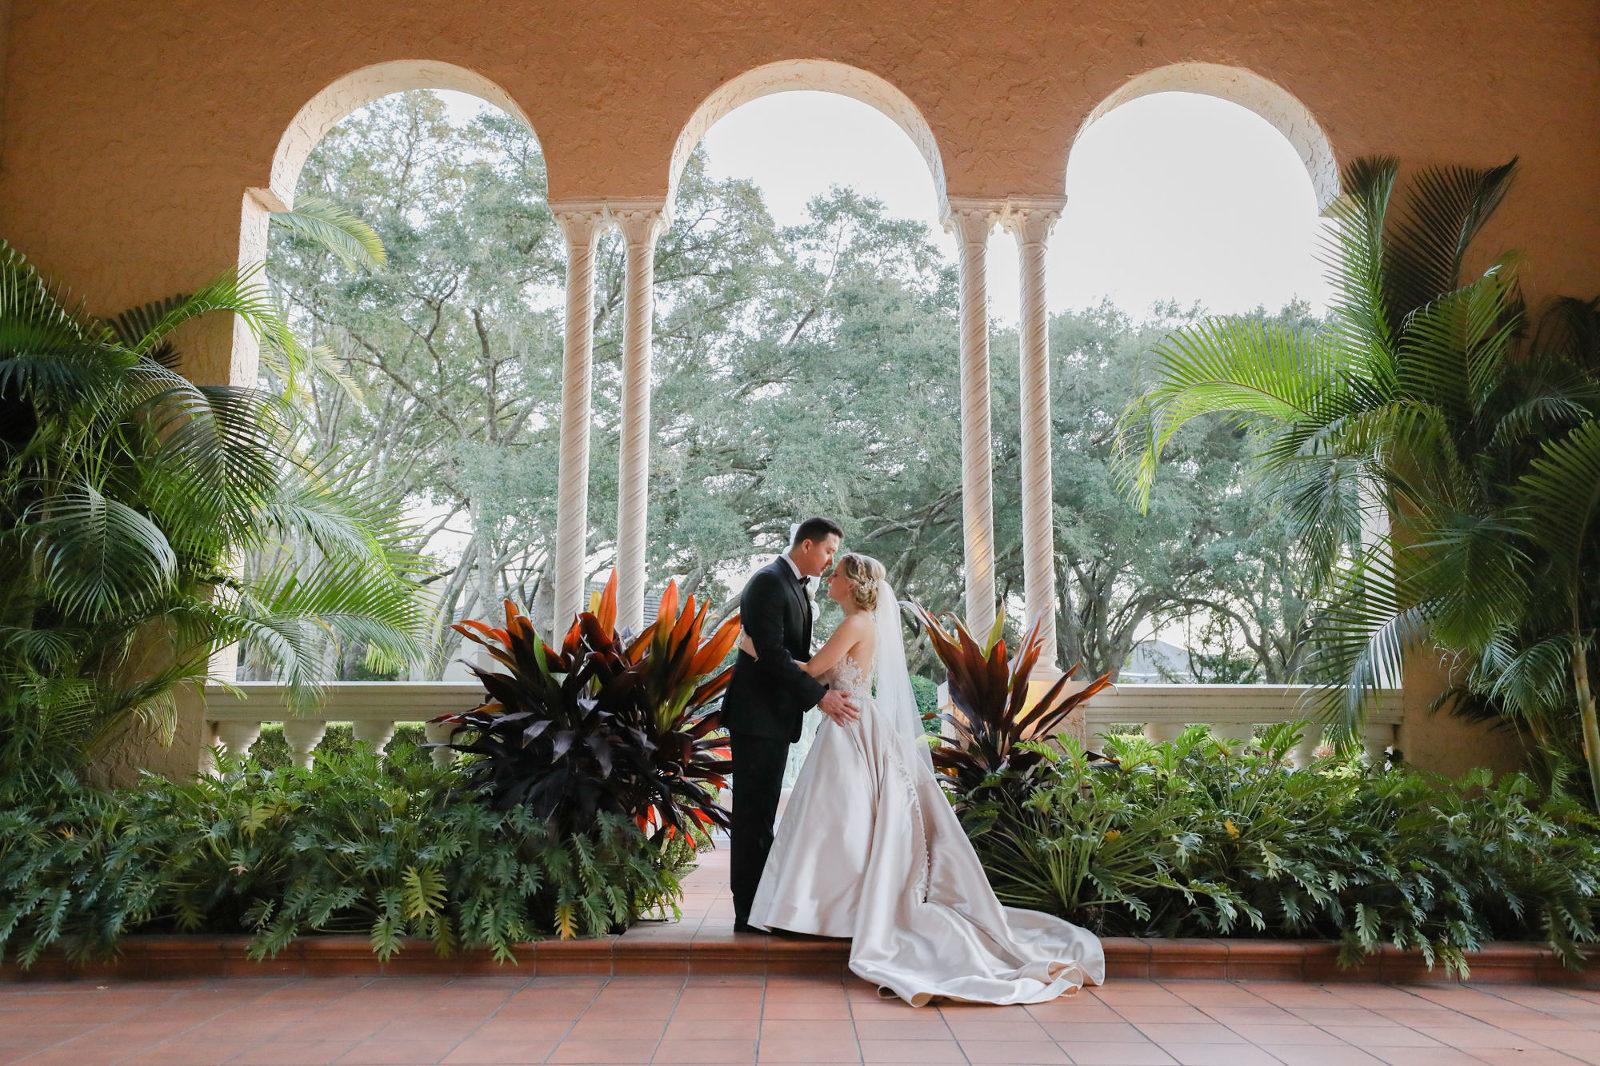 Bride and Groom Outdoor Garden Wedding Portrait | Tampa Bay Wedding Photographer Lifelong Photography Studio | Tampa Wedding Venue Avila Golf & Country Club